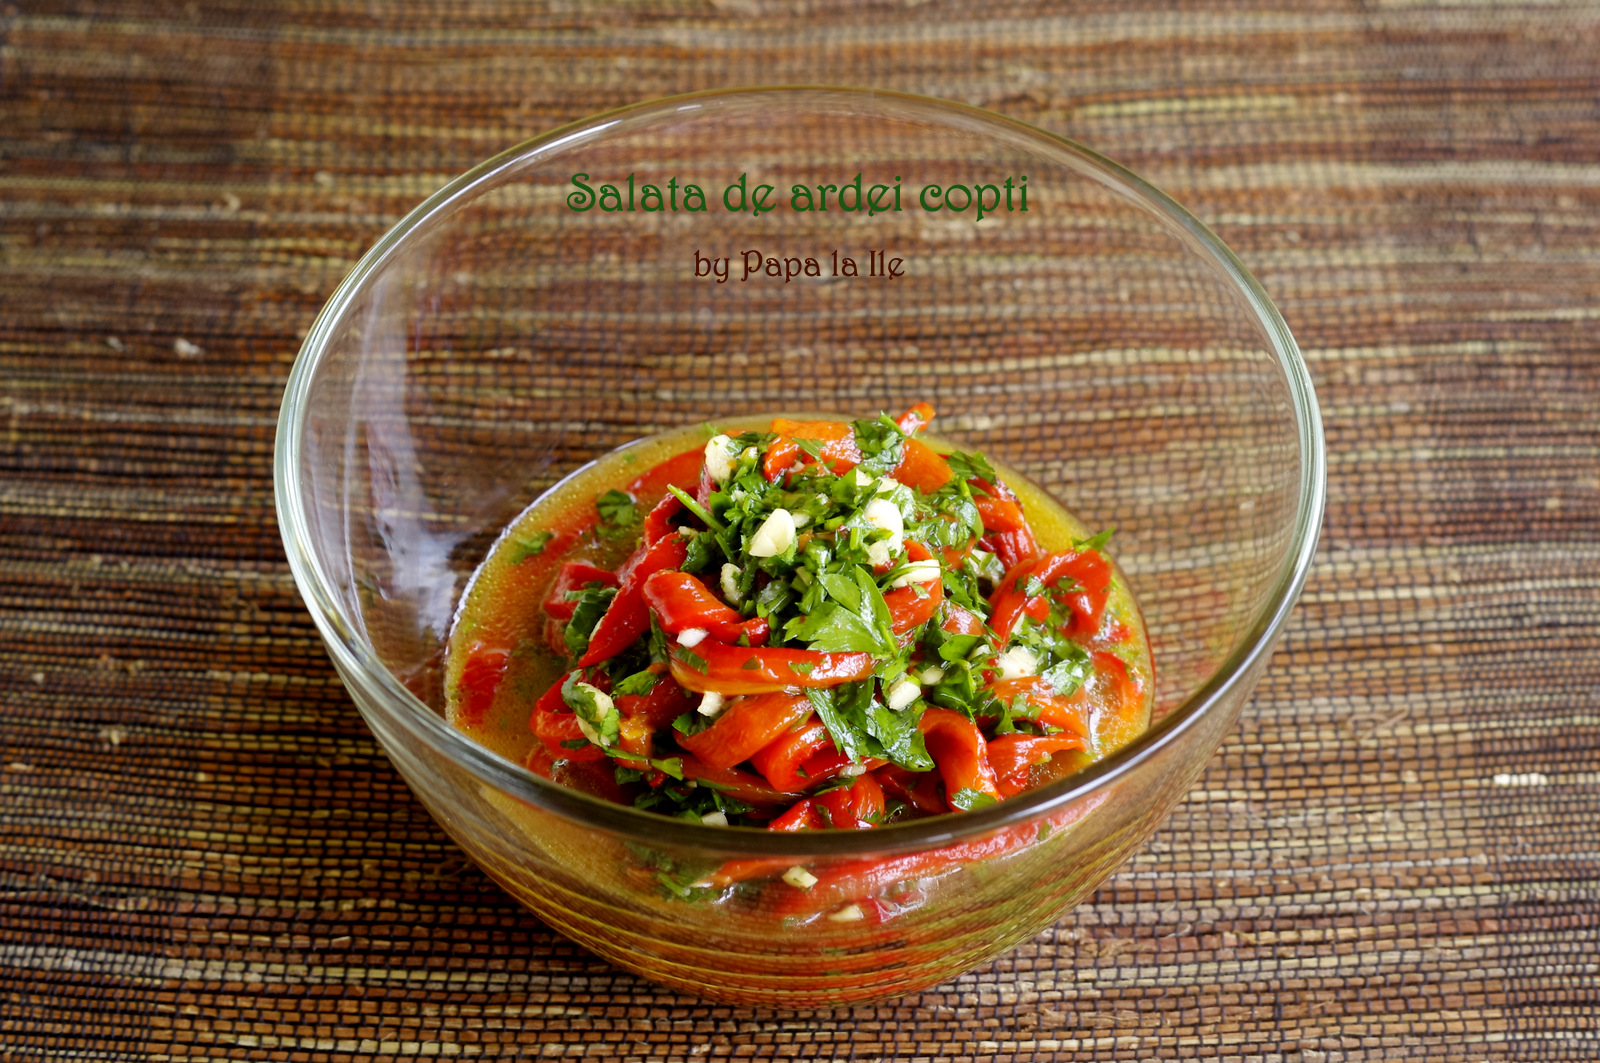 Salata de vinete, salata de ardei copti (4)